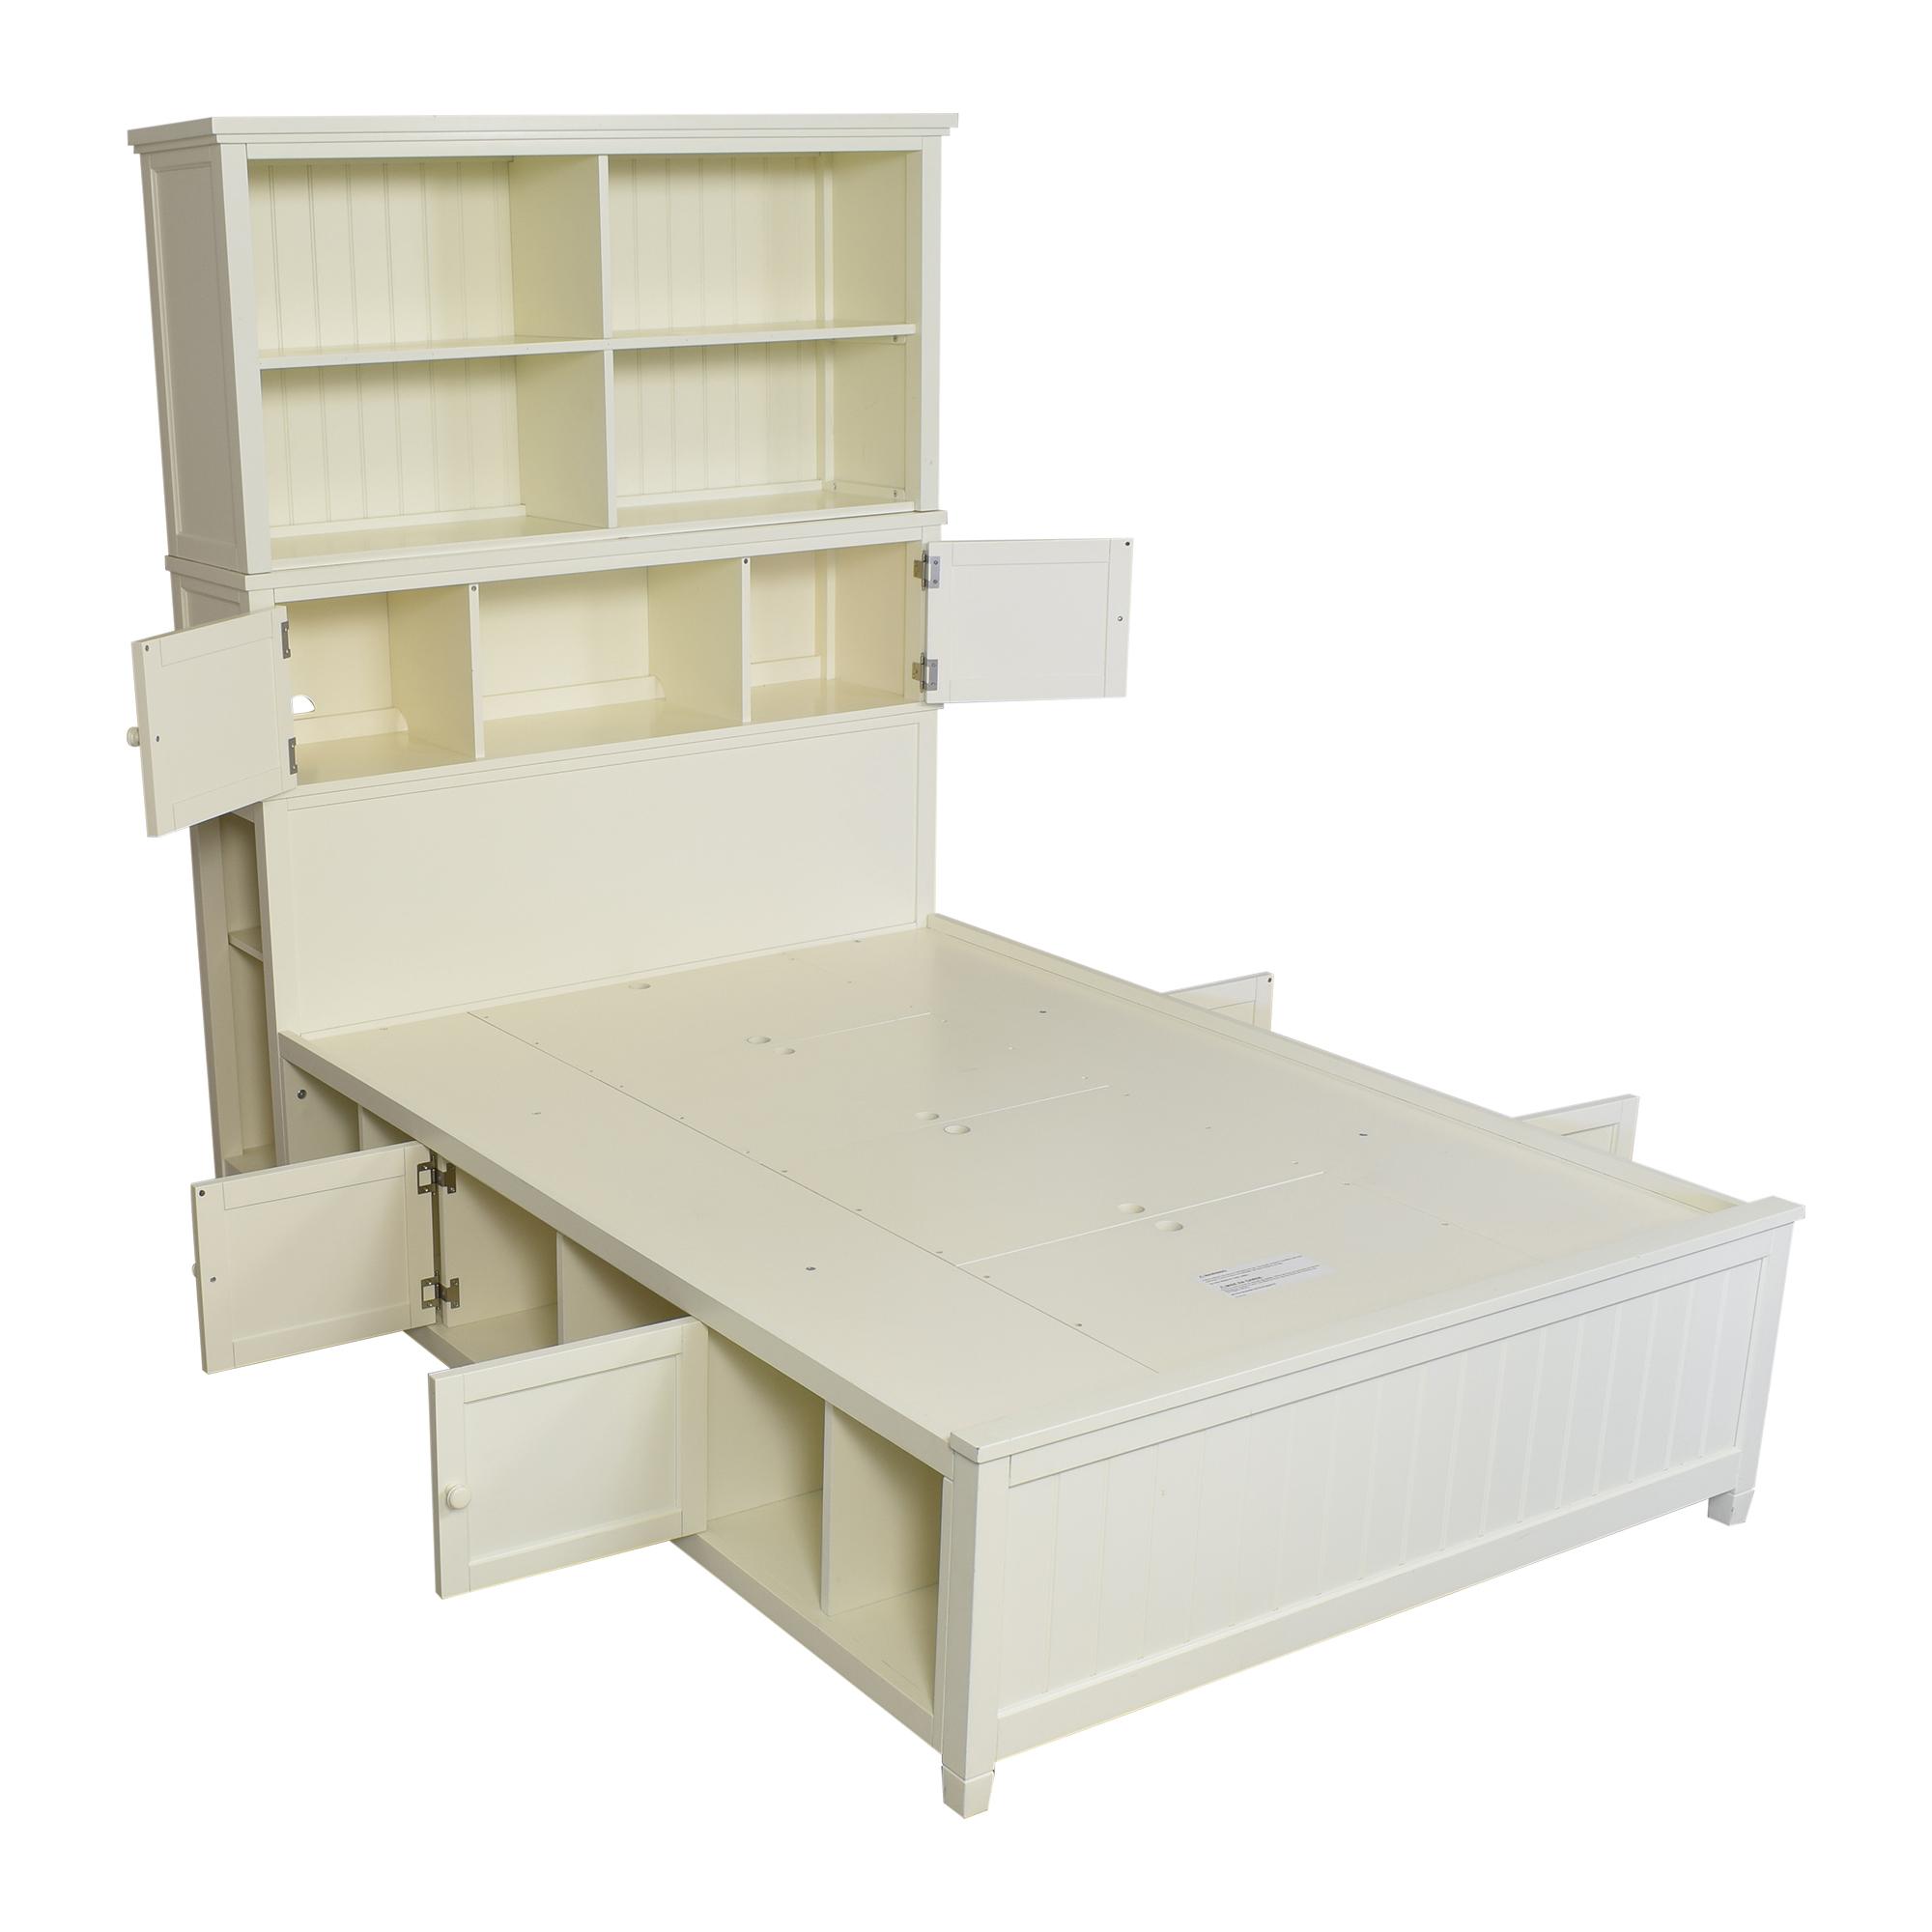 Pottery Barn Teen Pottery Barn Teen Beadboard Storage Full Bed on sale